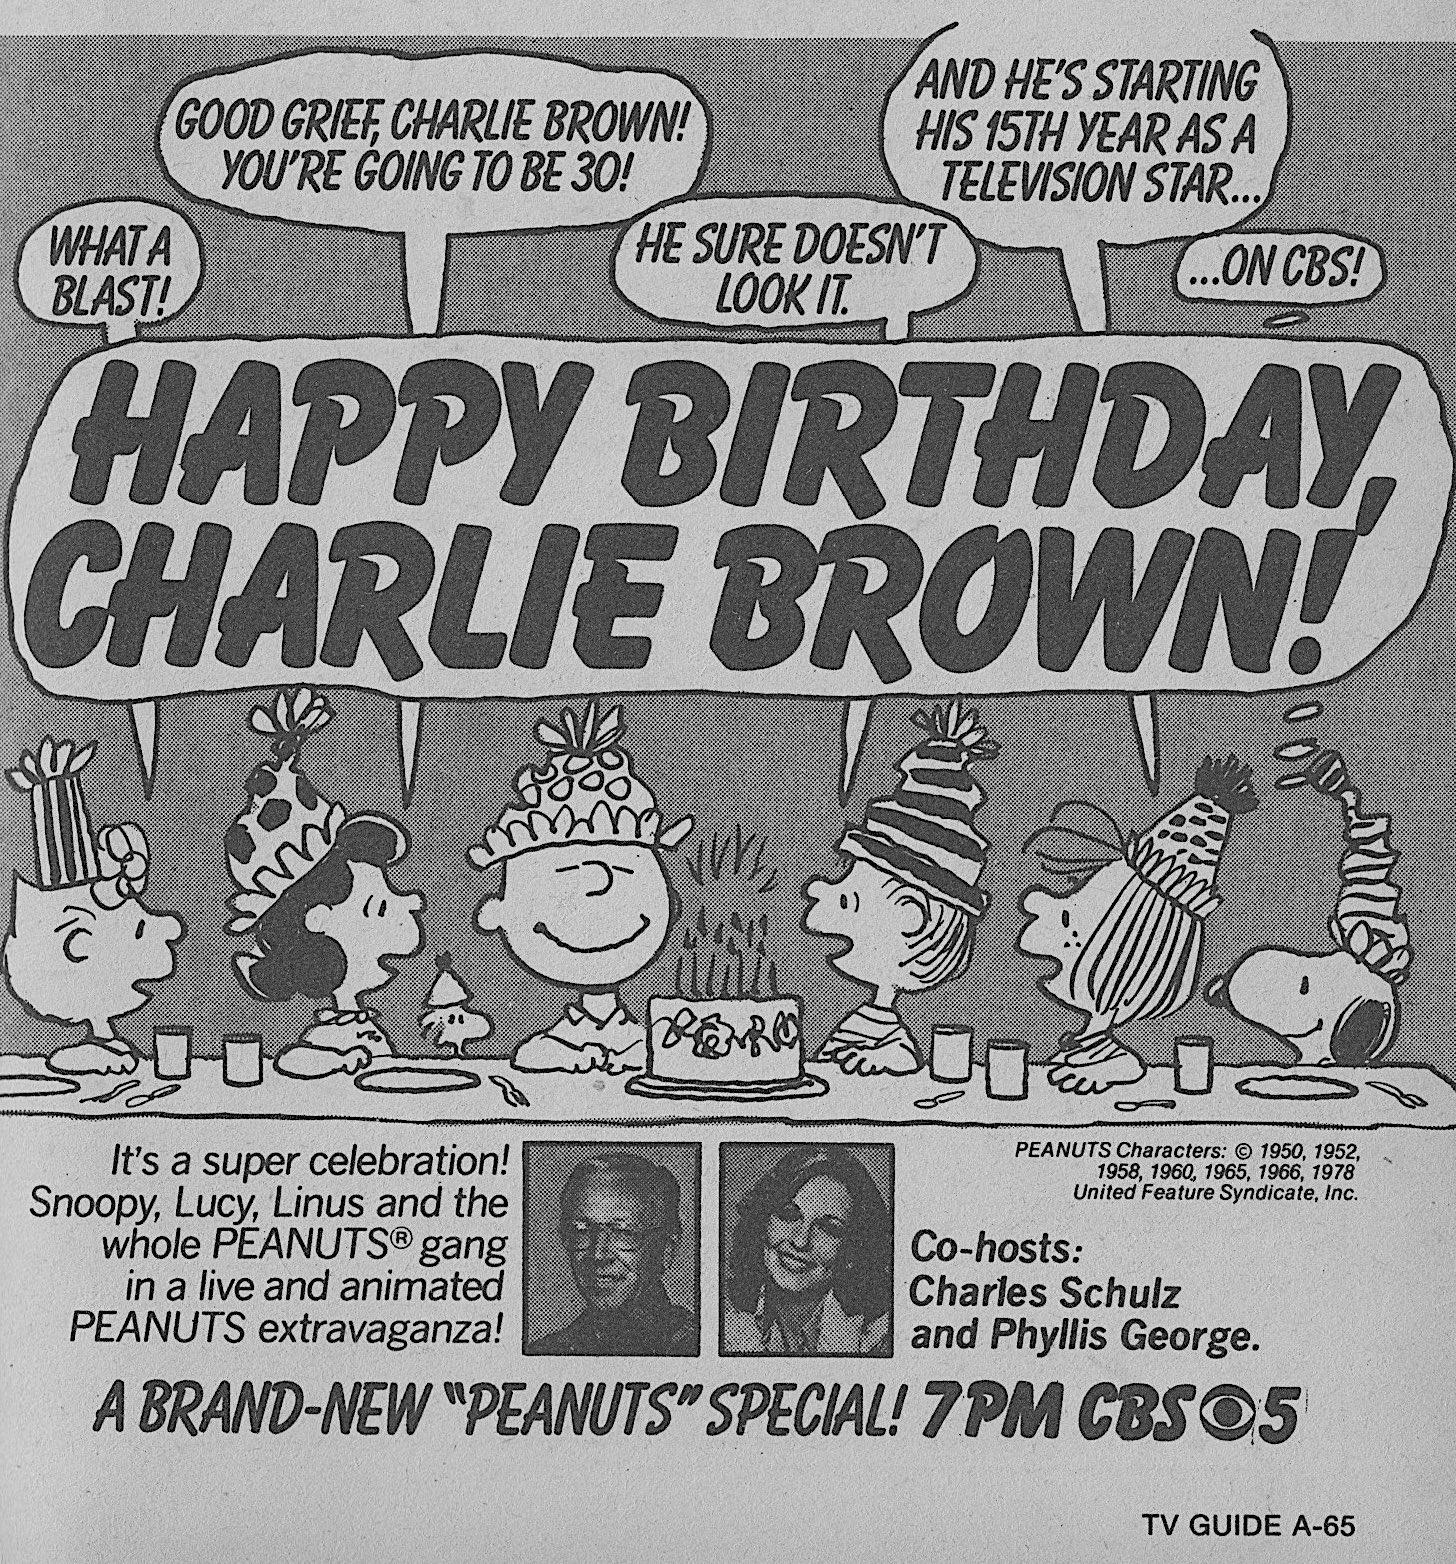 Retronewsnow On Twitter Cbs Primetime January 5 1979 Happy Birthday Charlie Brown